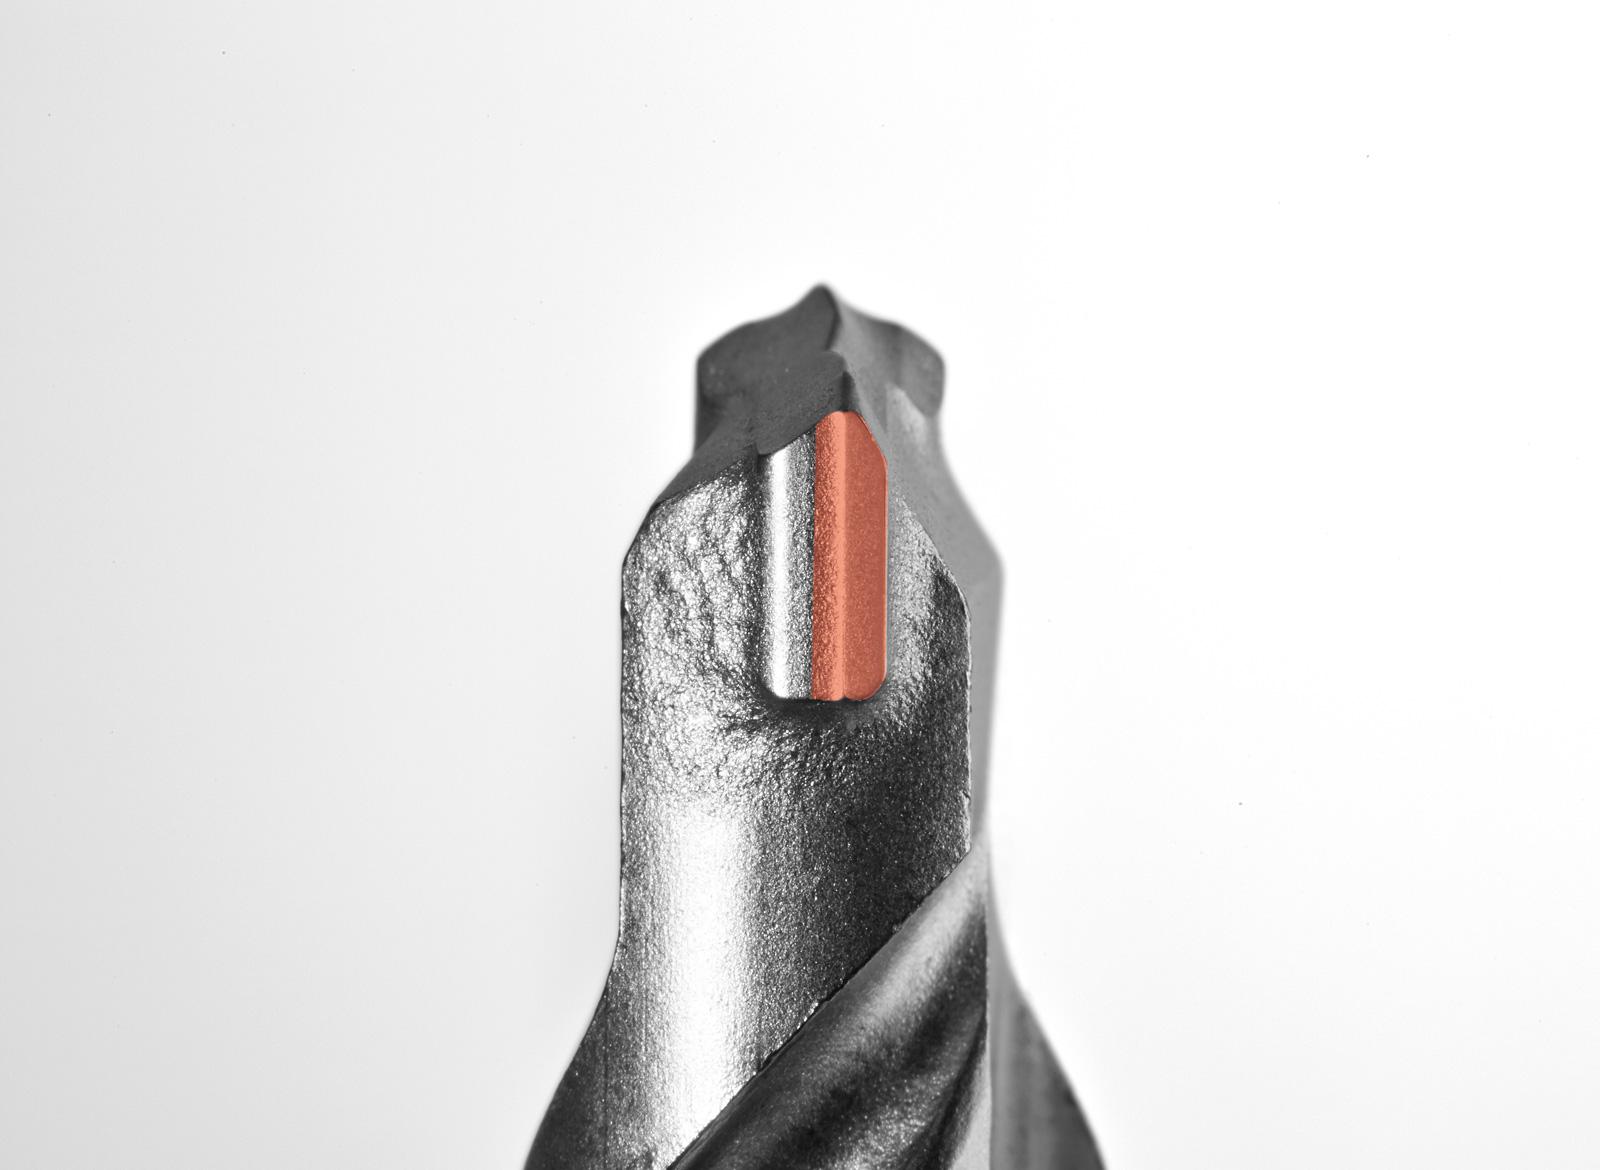 PROJAHN Hammerbohrer Rocket 3 SDS plus 8 mm x 160 mm 8308160 Profi Steinbohrer